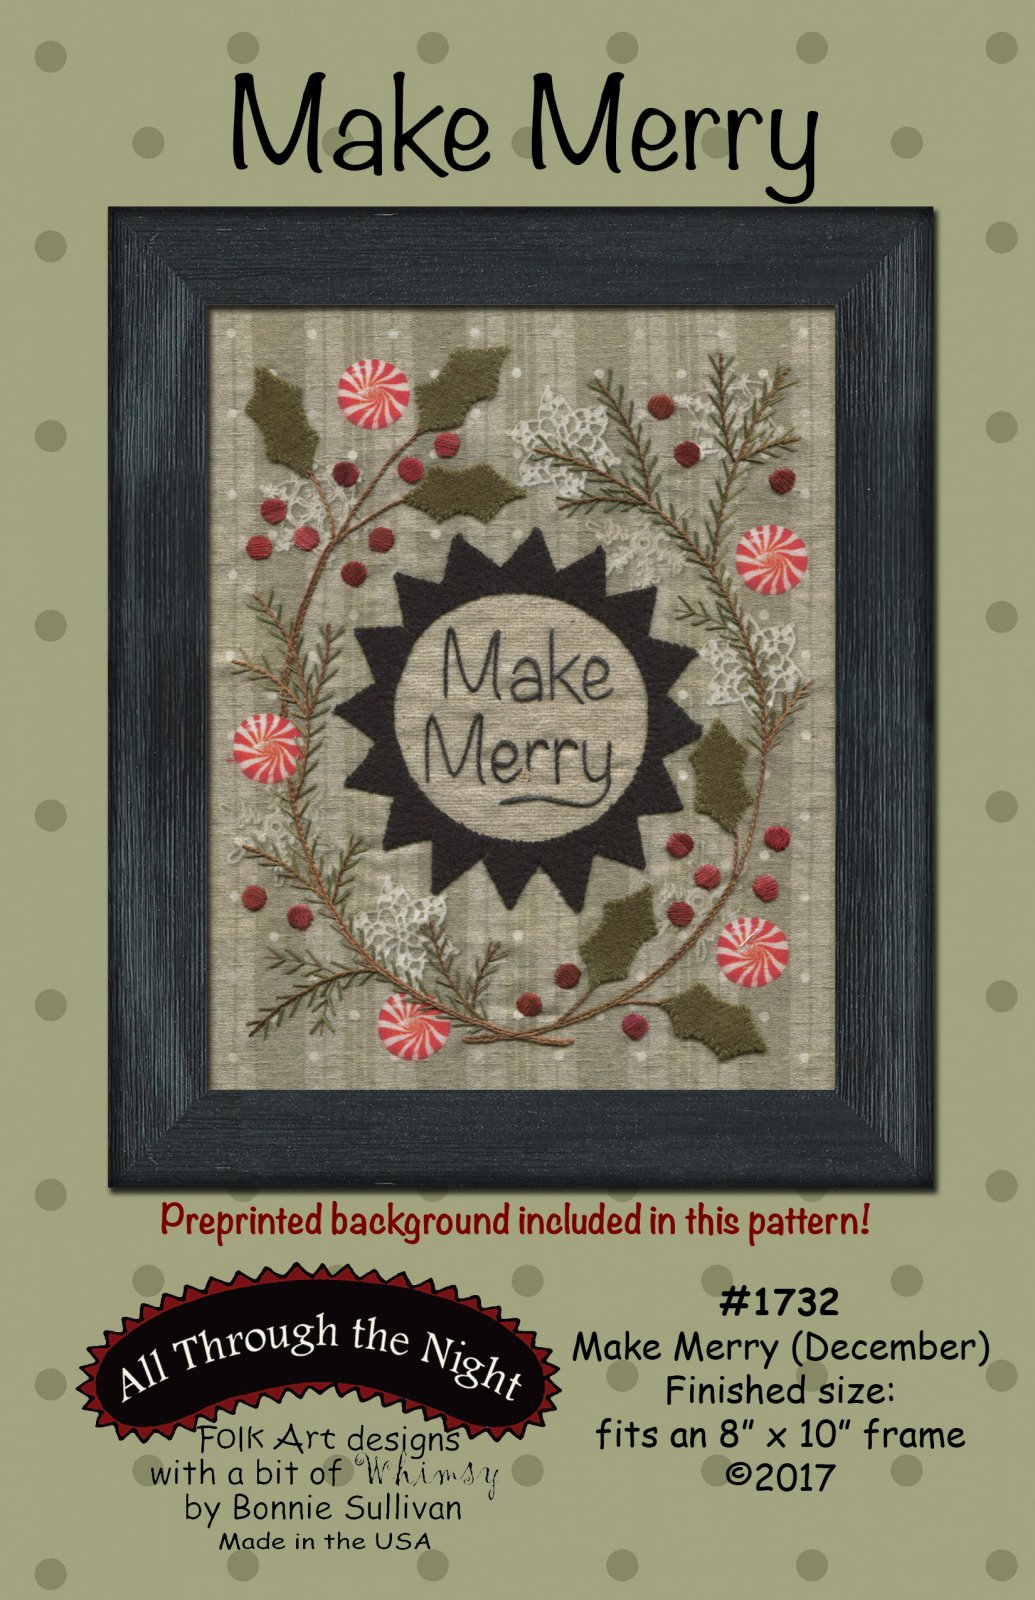 1732 Make Merry (December)